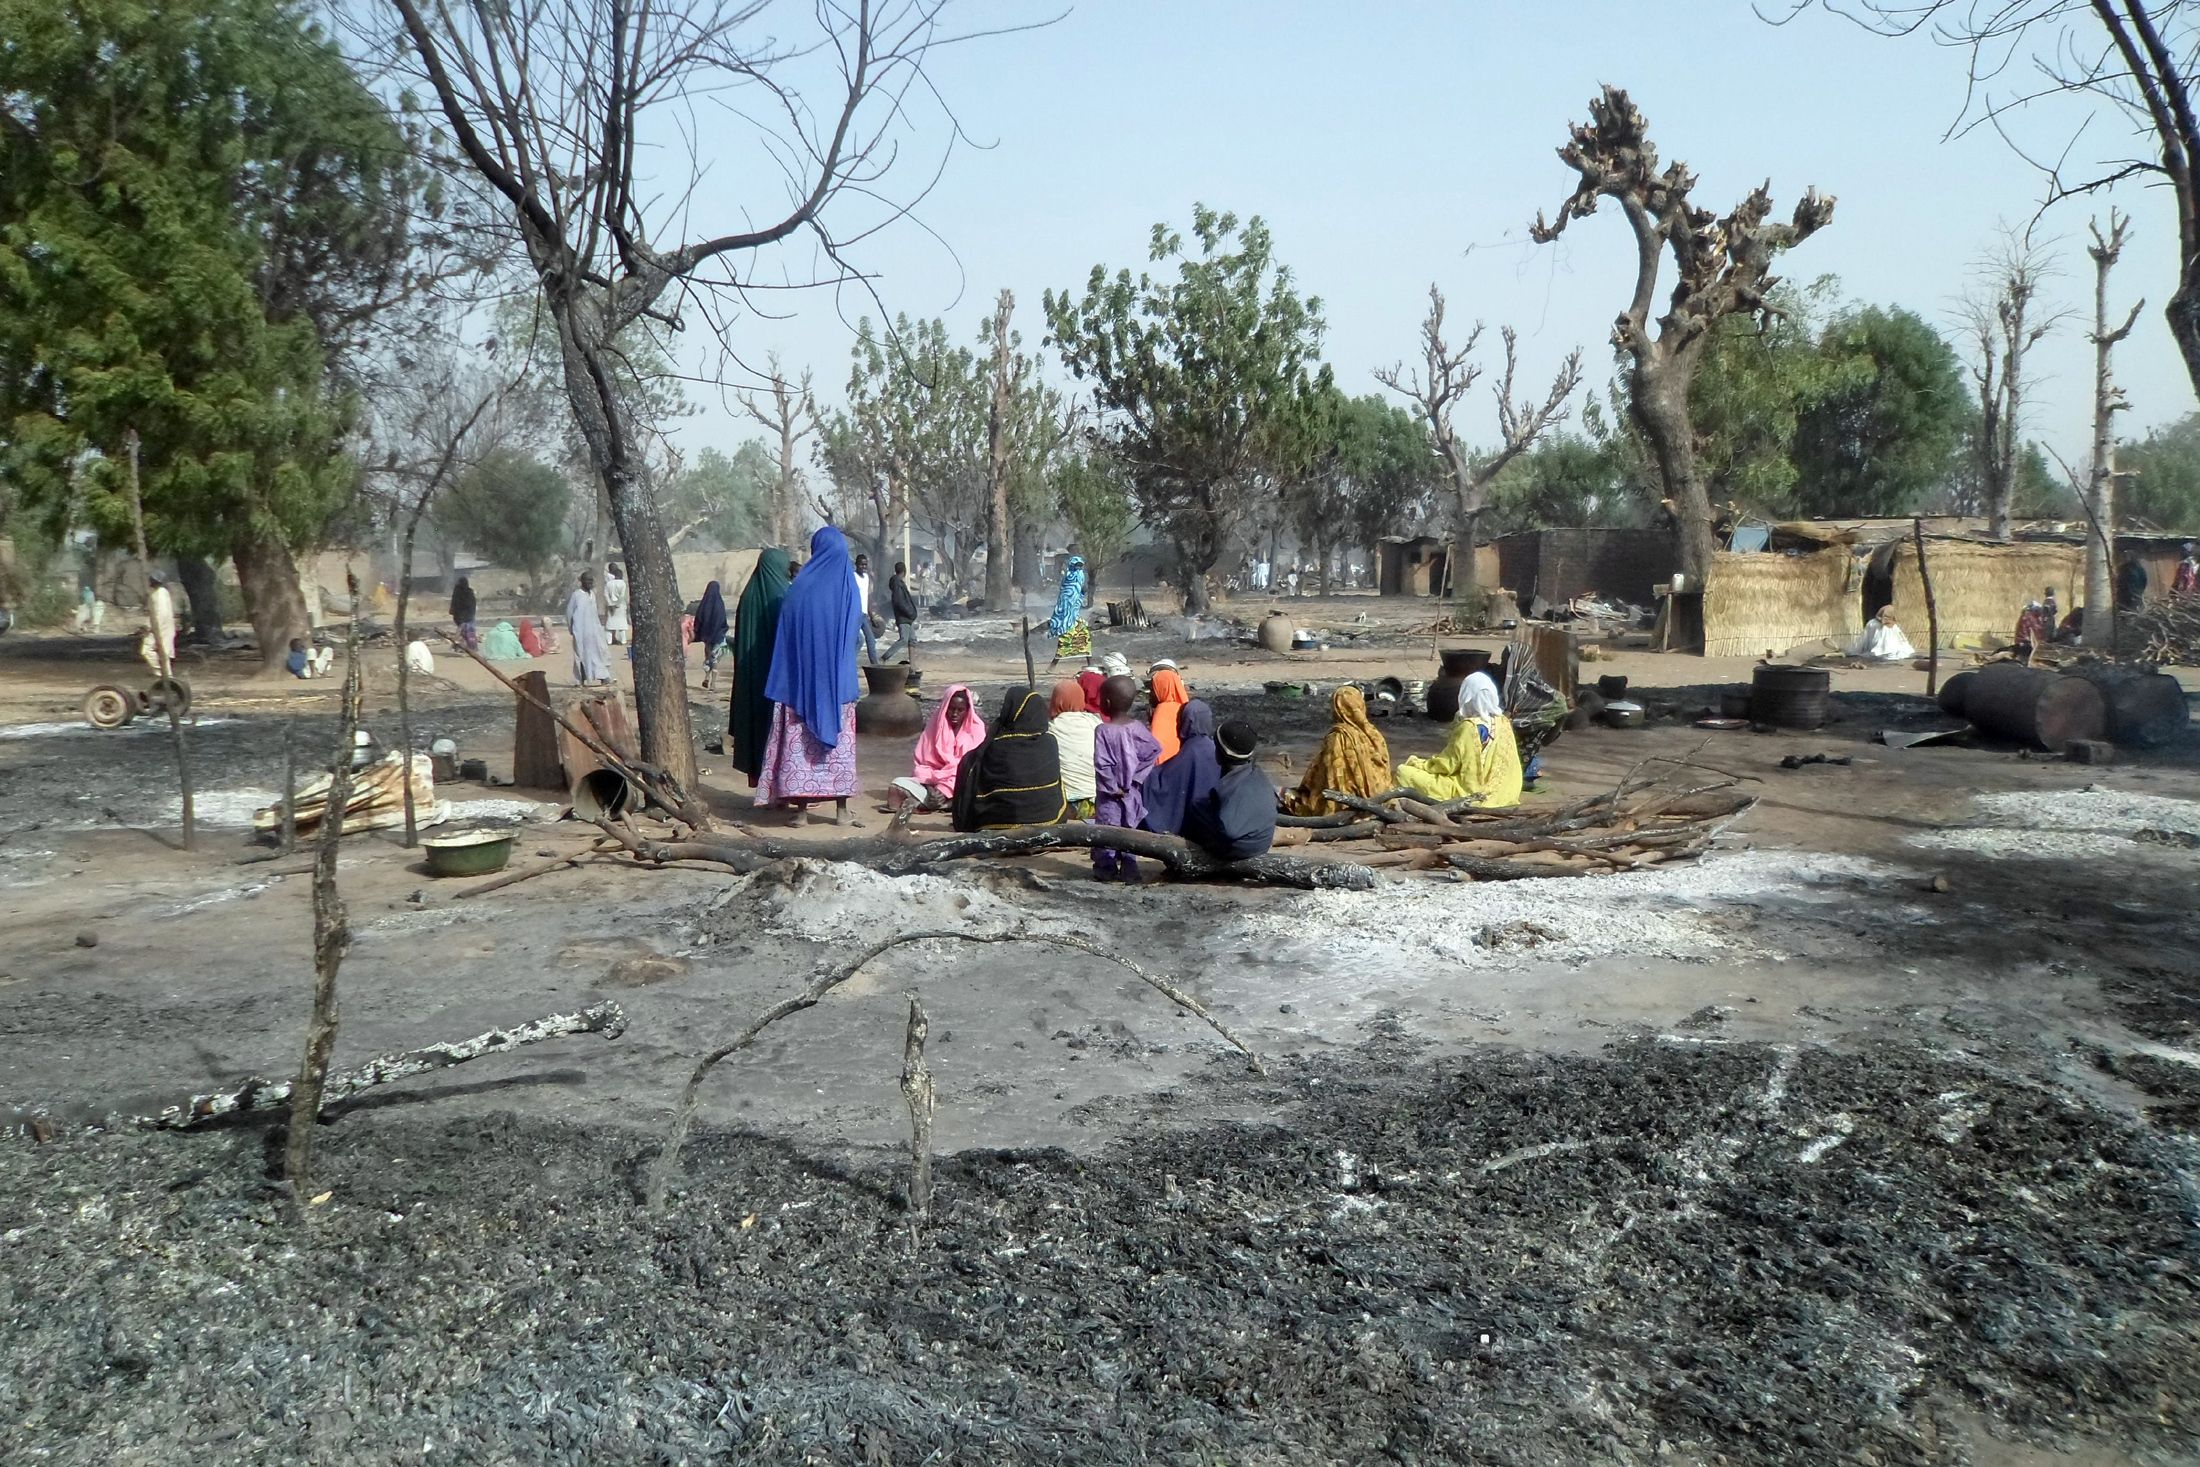 Victims of a Boko Haram attack sit amid burnt houses in Dalori, near Maiduguri, Nigeria.